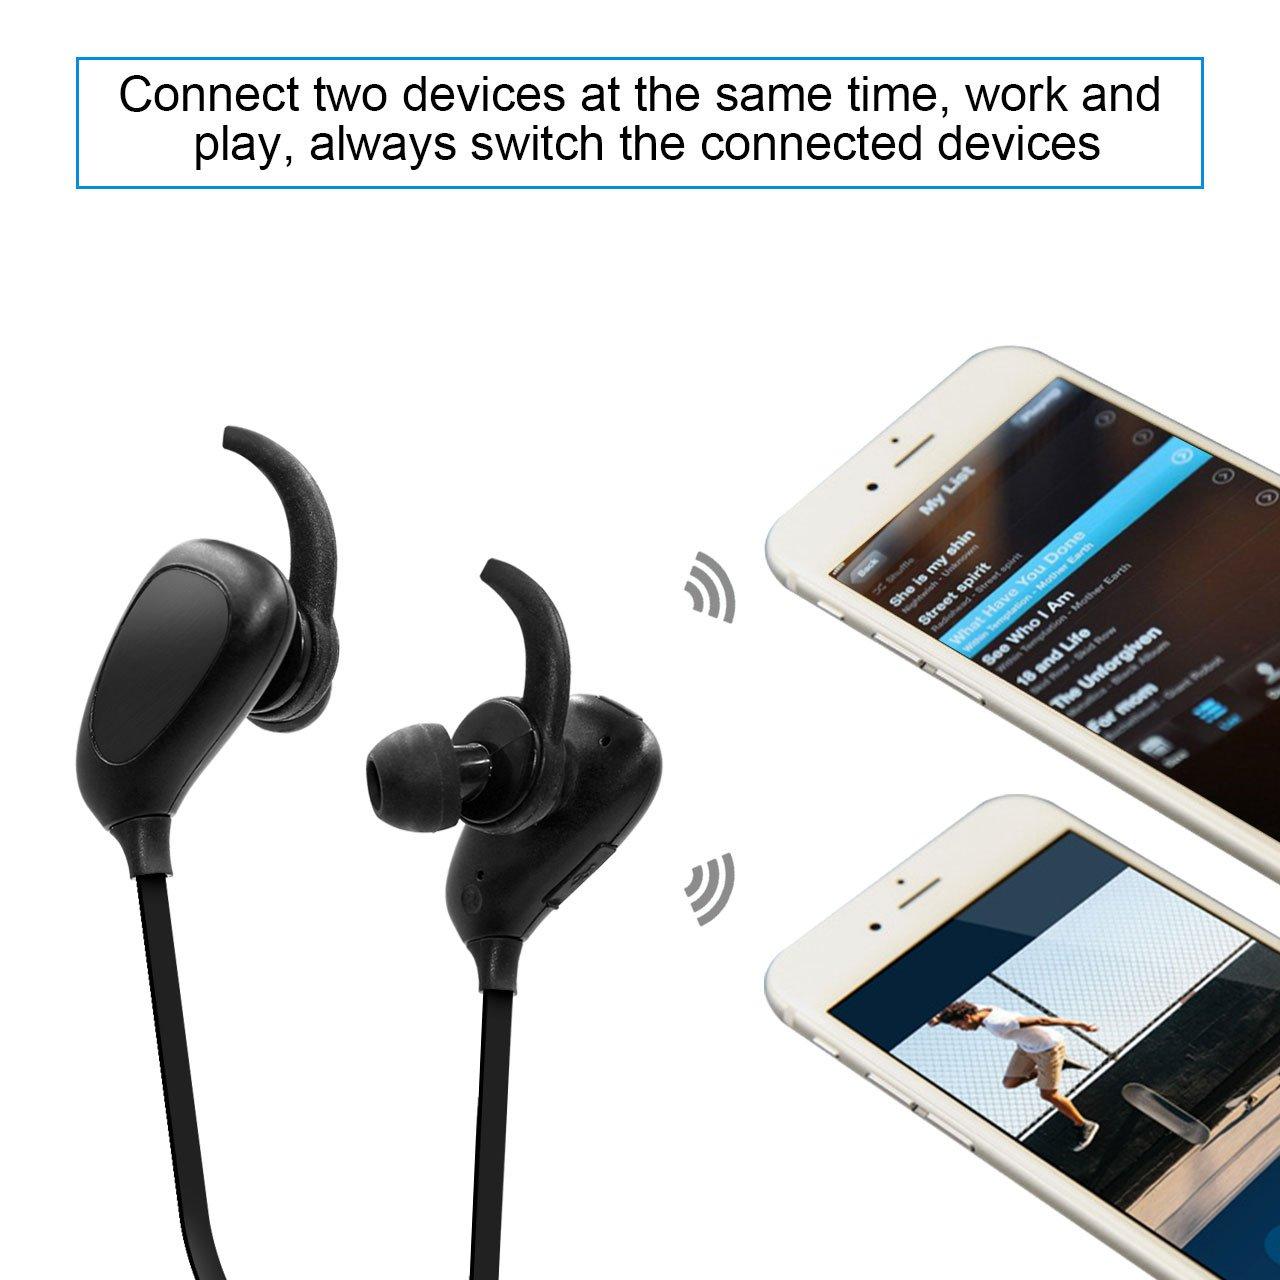 Auriculares Inalámbricos Bluetooth, NickSea Auriculares Bluetooth con Micrófono 3D Auriculares in Ear con Sonido Estéreo, Manos Libres Auriculares Movíl, ...